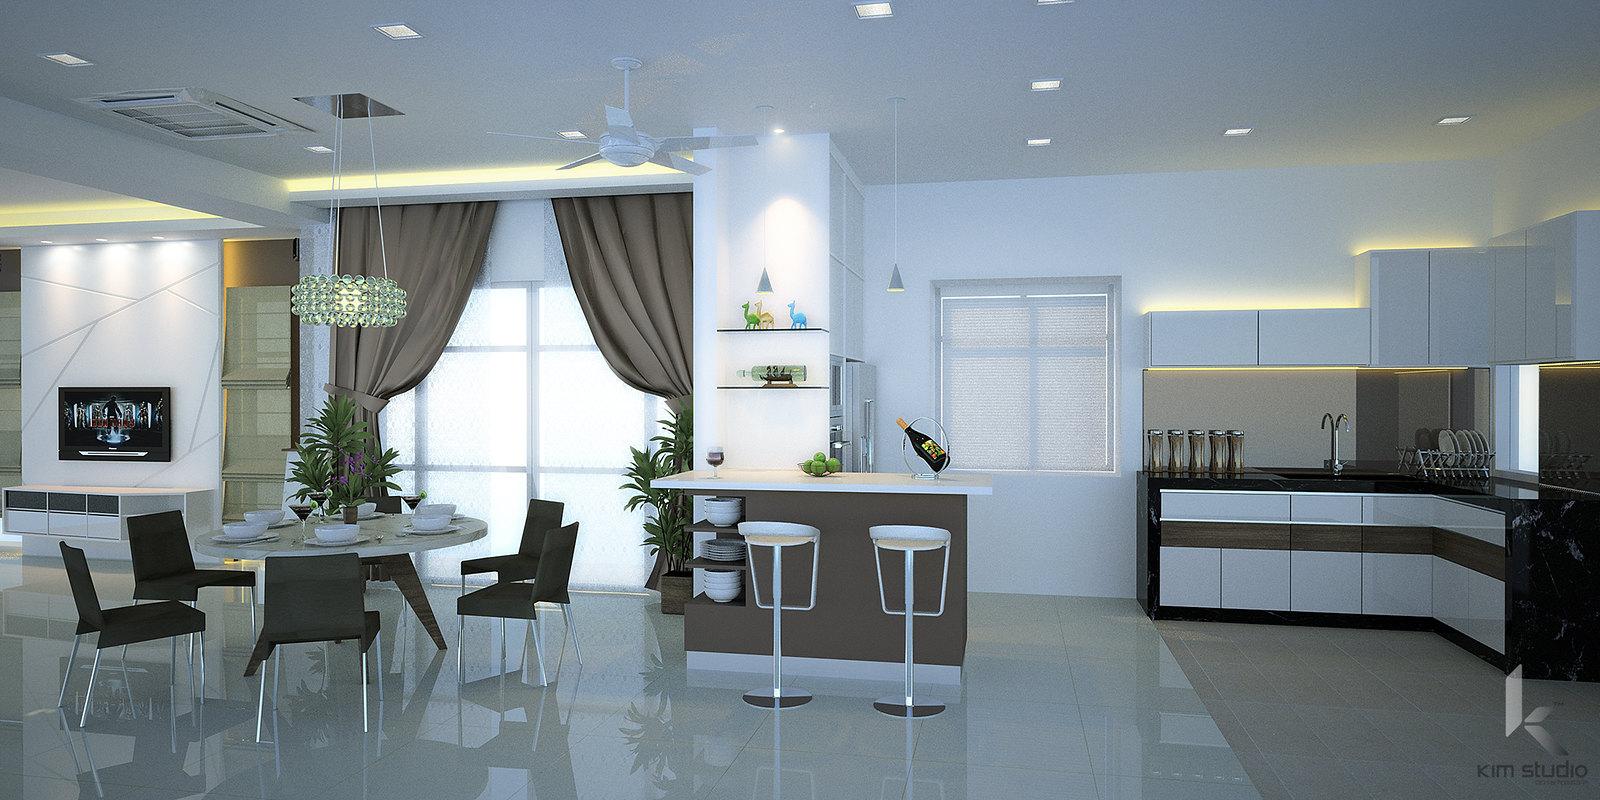 Kim Studio: Semi-Detached House, Areca Residence, Kepong Kuala Lumpur